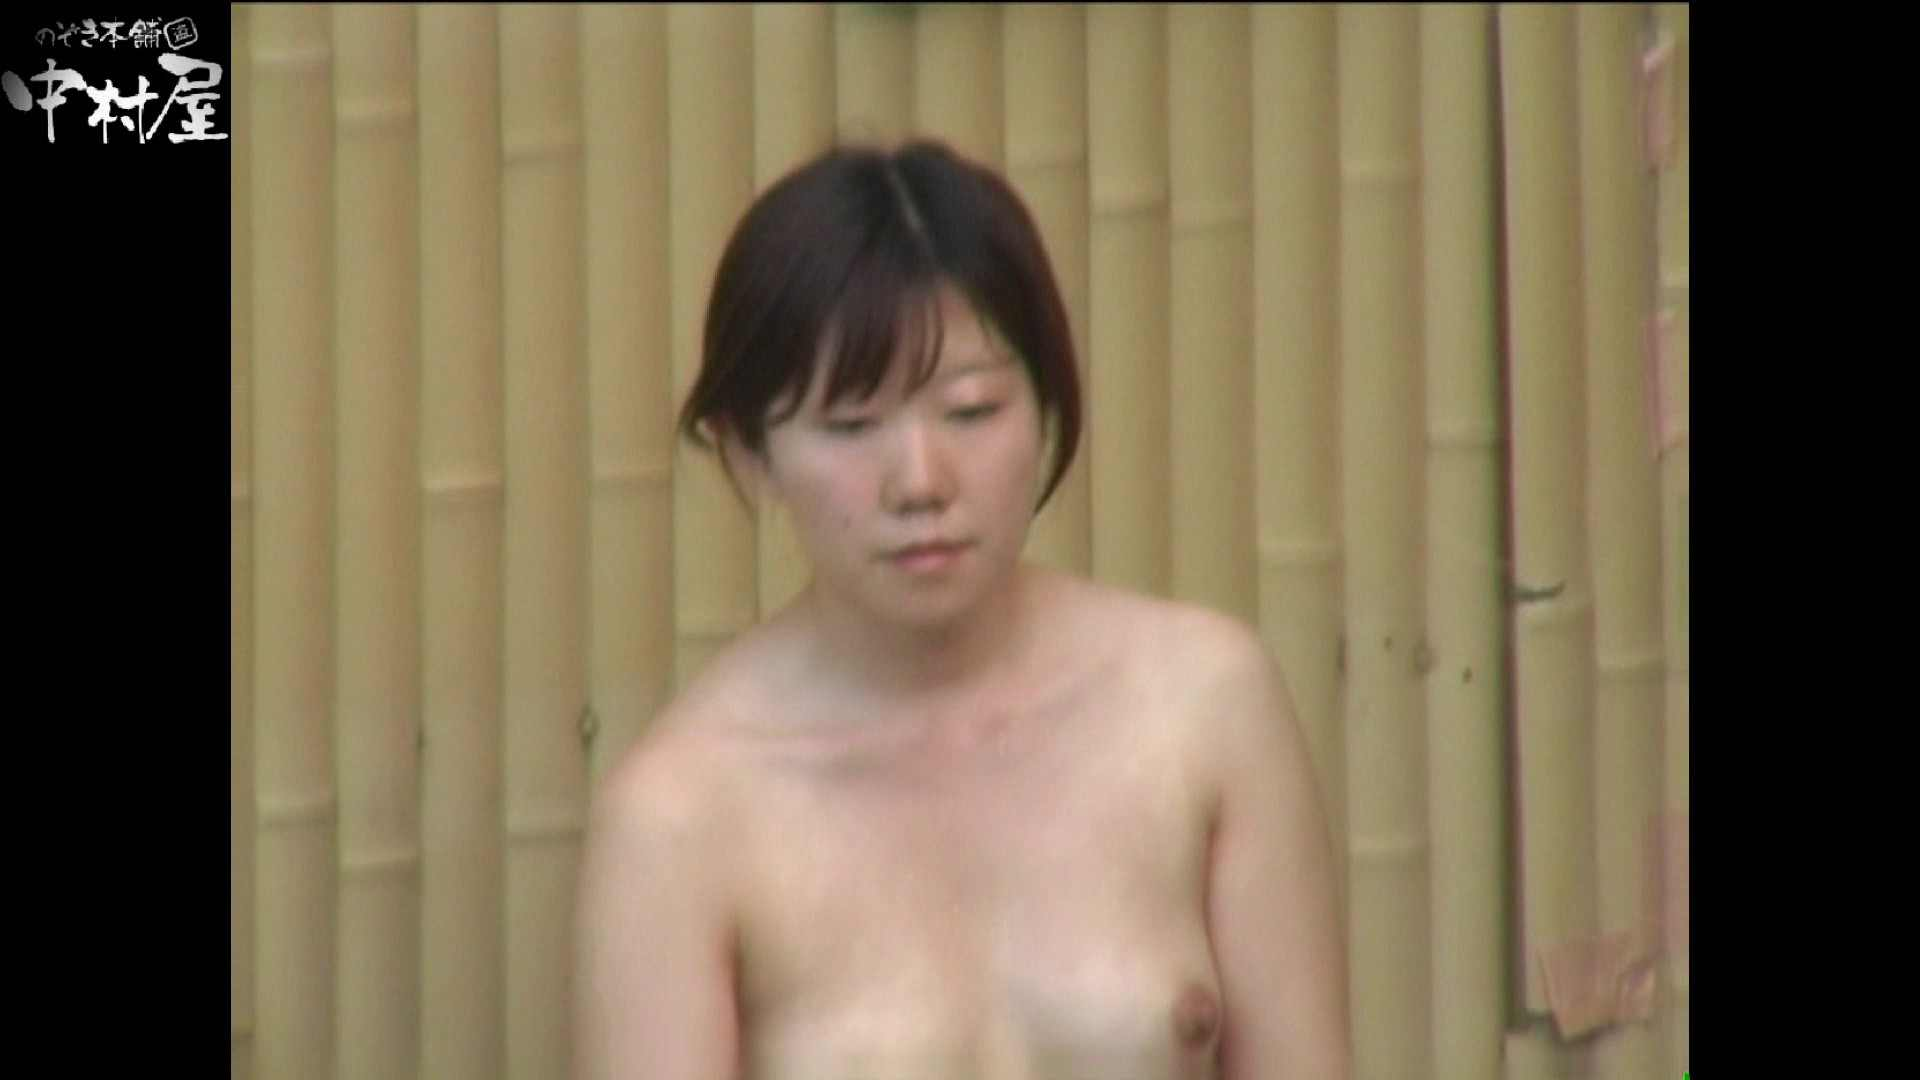 Aquaな露天風呂Vol.977 盗撮師作品  83pic 36